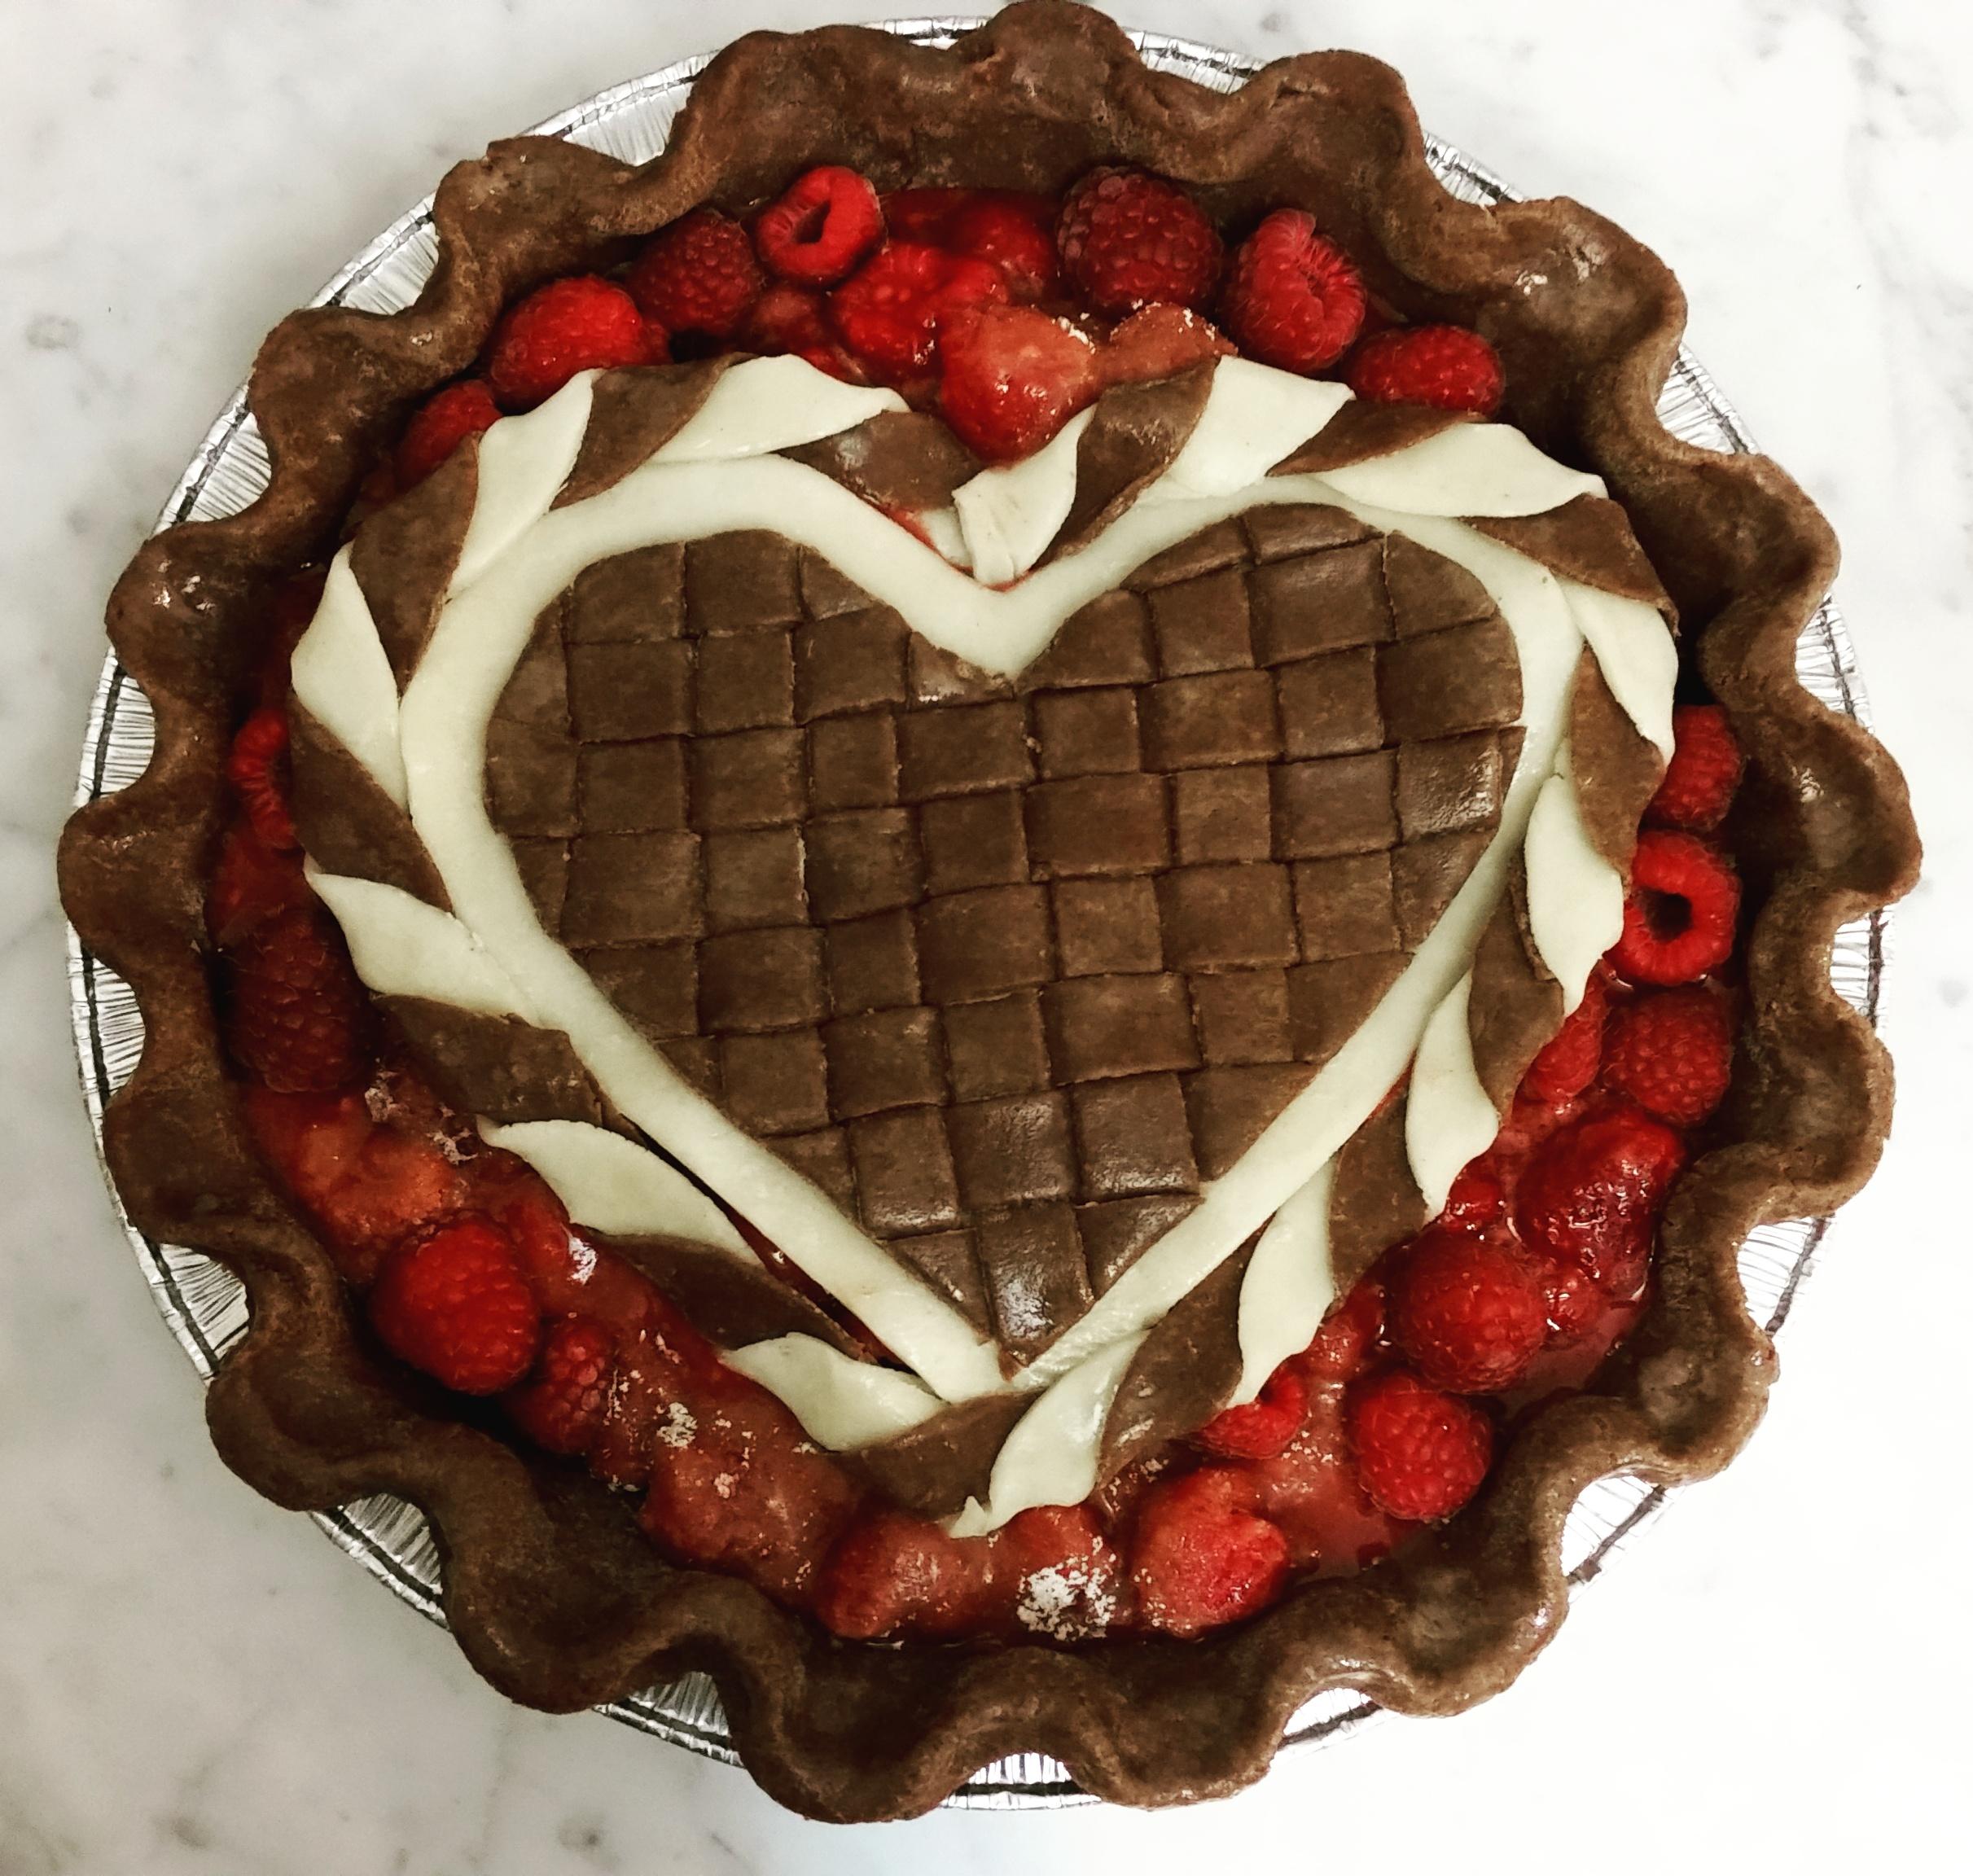 Raspberry Pie with mixed dough